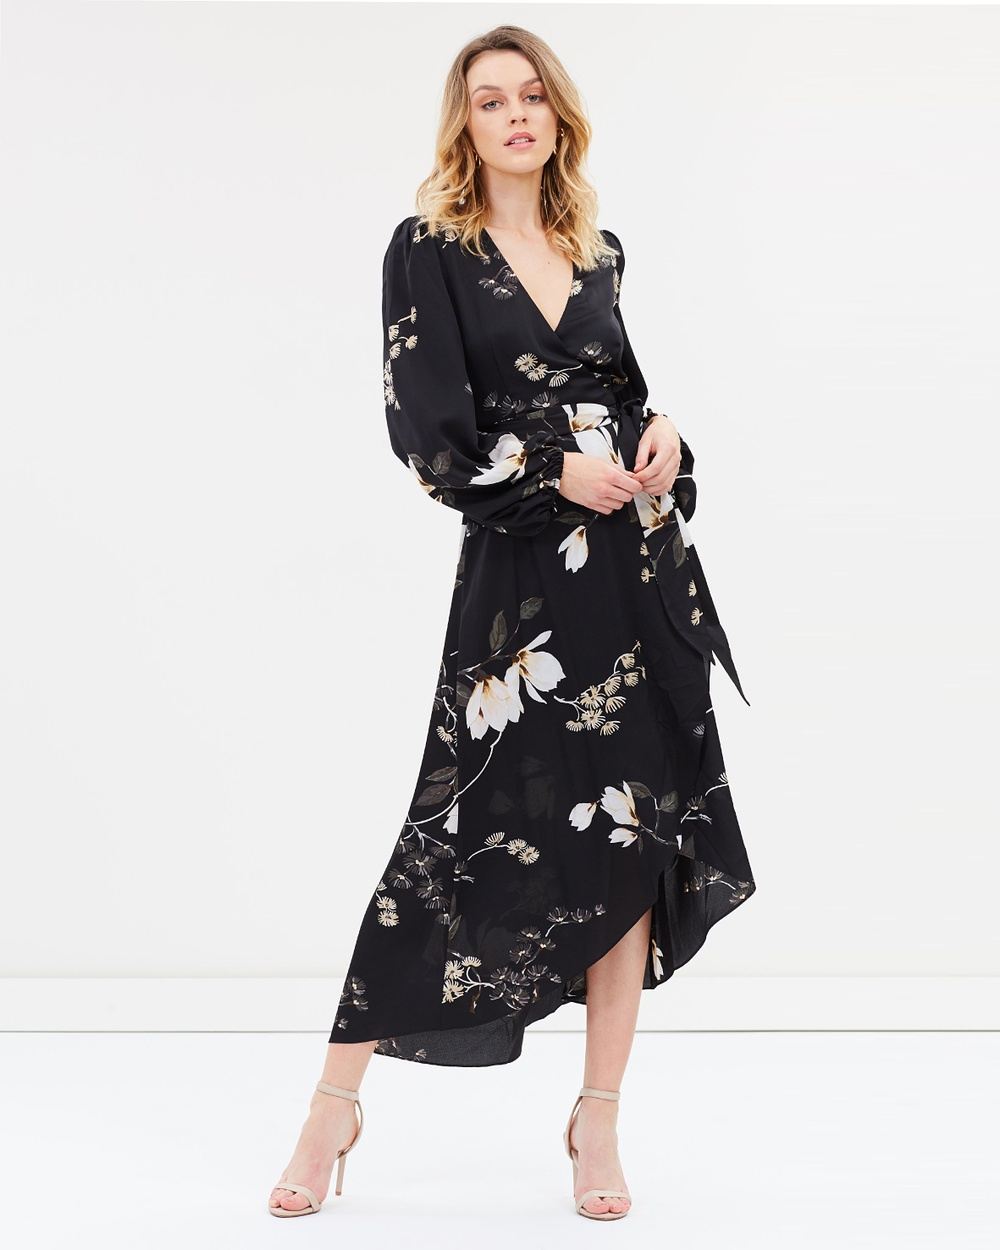 Shona Joy Black & Multi Wrap Midi Dress